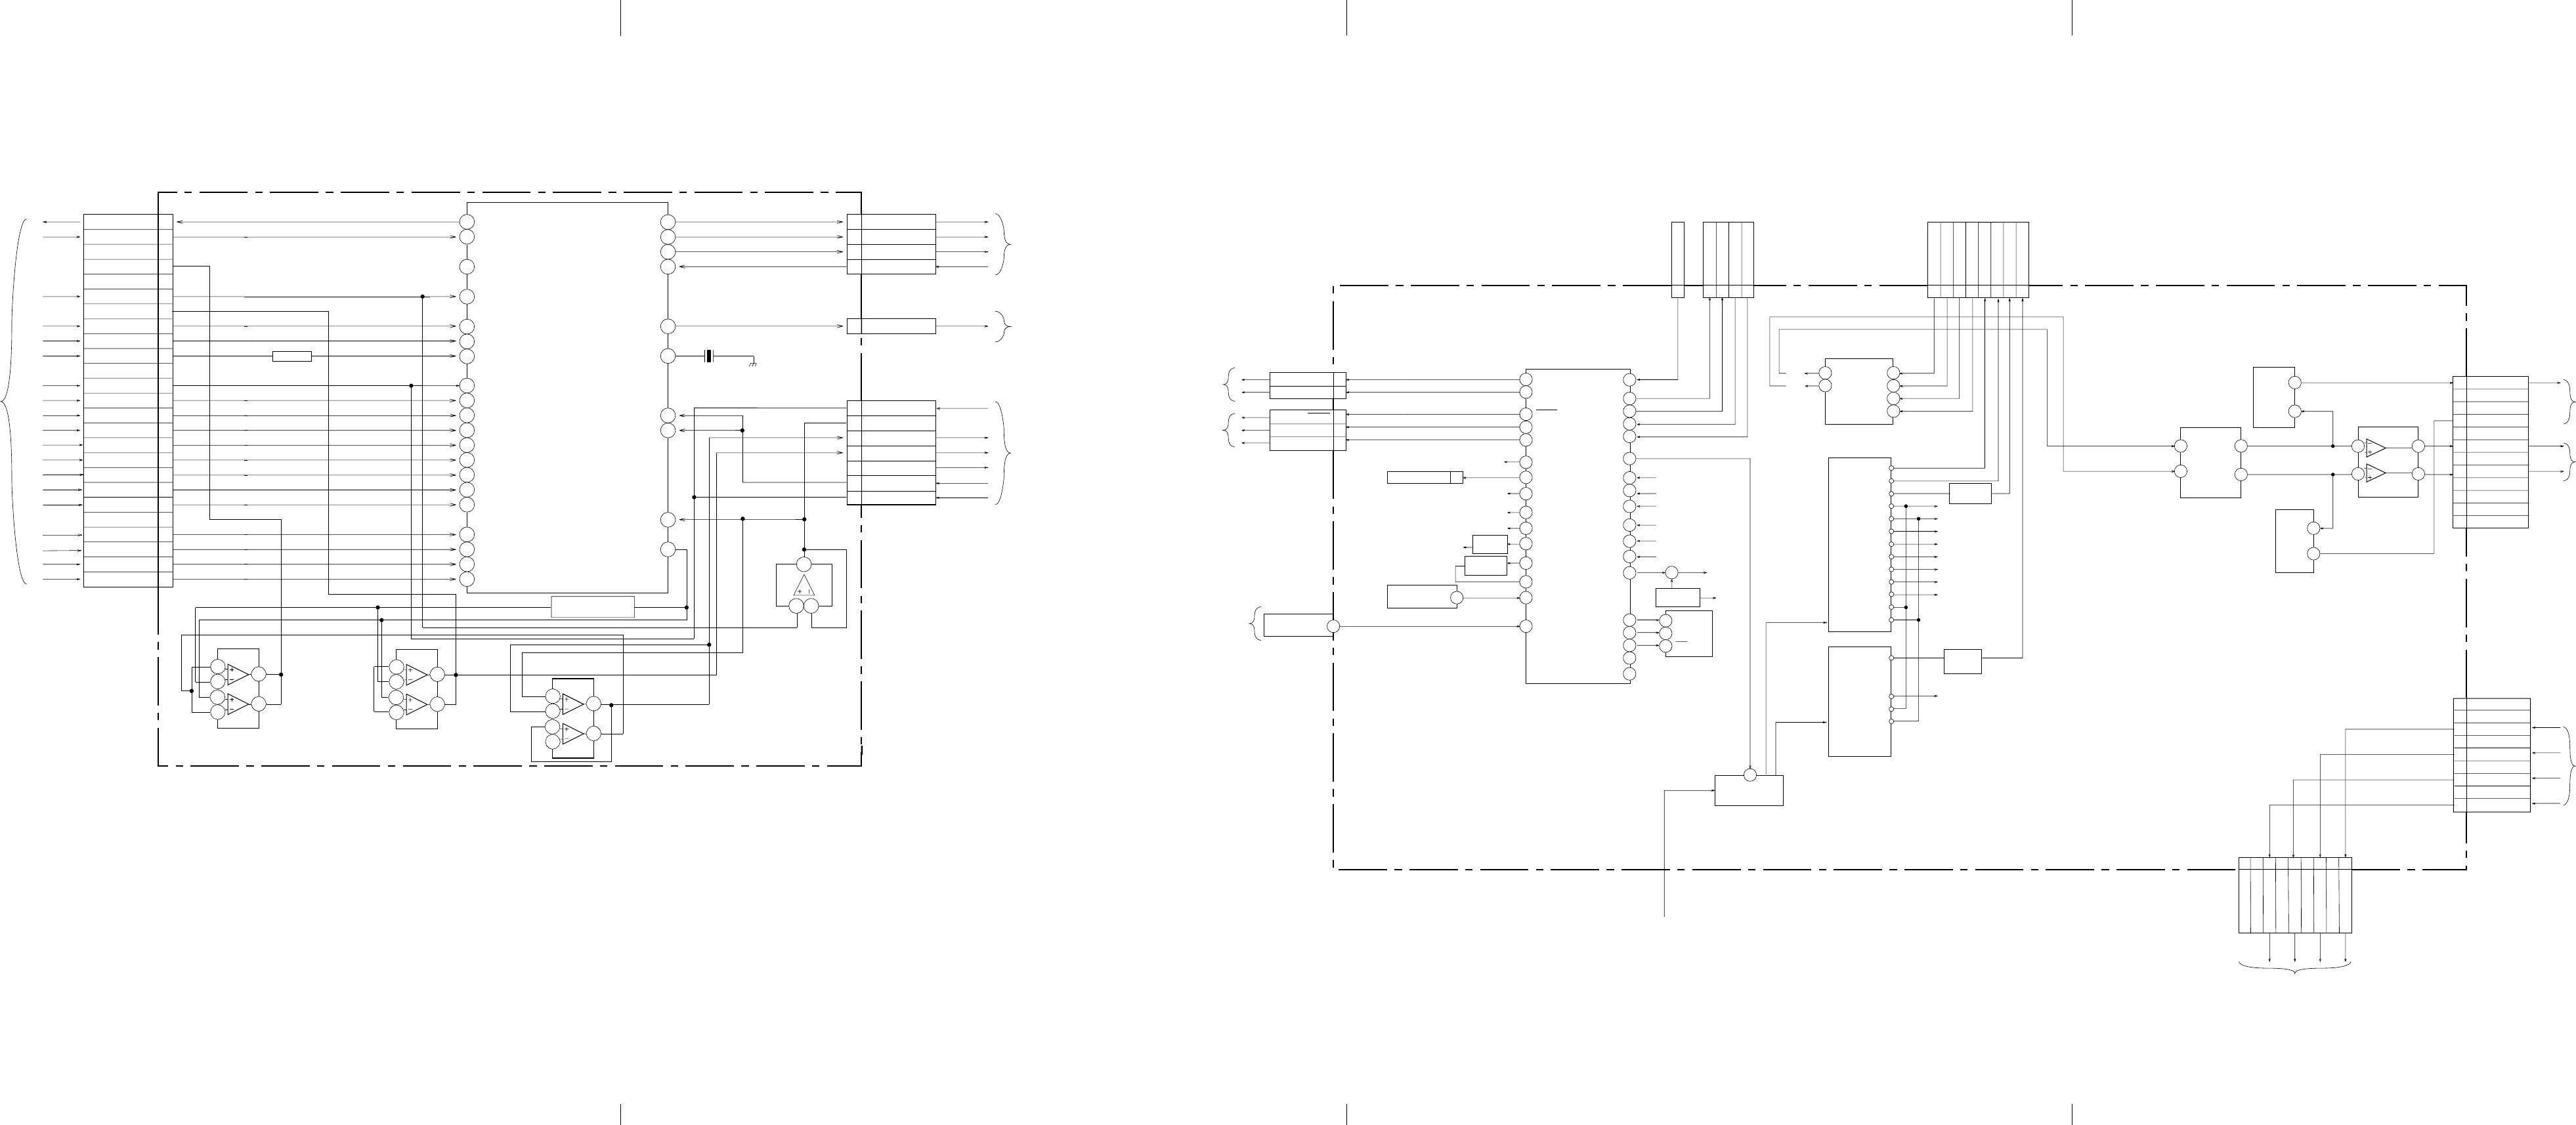 Sony Trinitron Kv Es29m90 Users Manual Technology Malaysia Sdn Bhd Diagram Wire Sensor Cdp 2 Snow 68 69